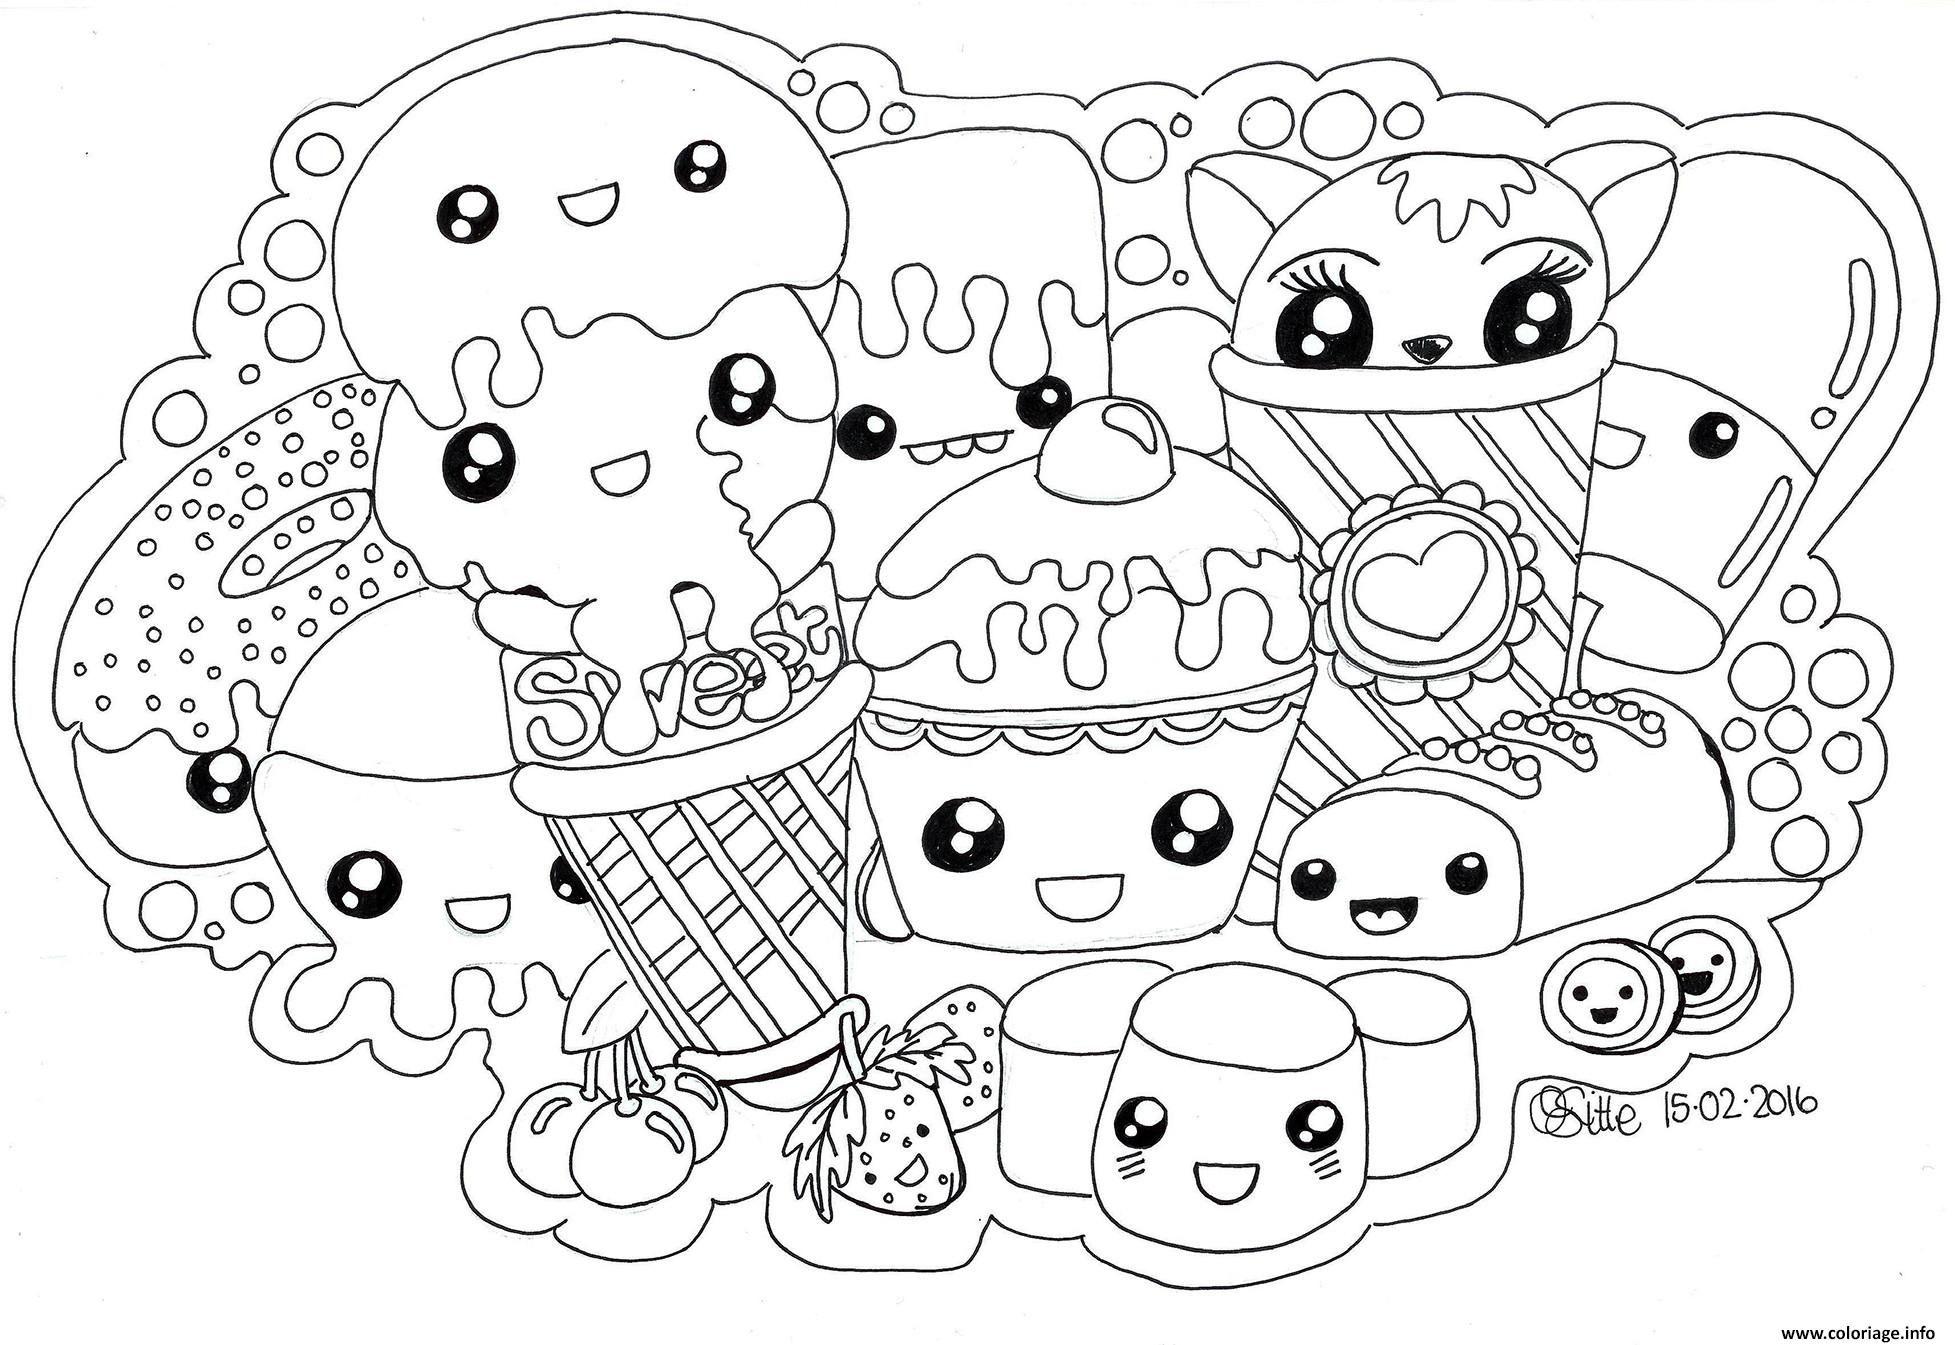 Maschera Colorante Capelli En 2020 Coloriage Kawaii Coloriage Manga Dessin Kawaii A Colorier